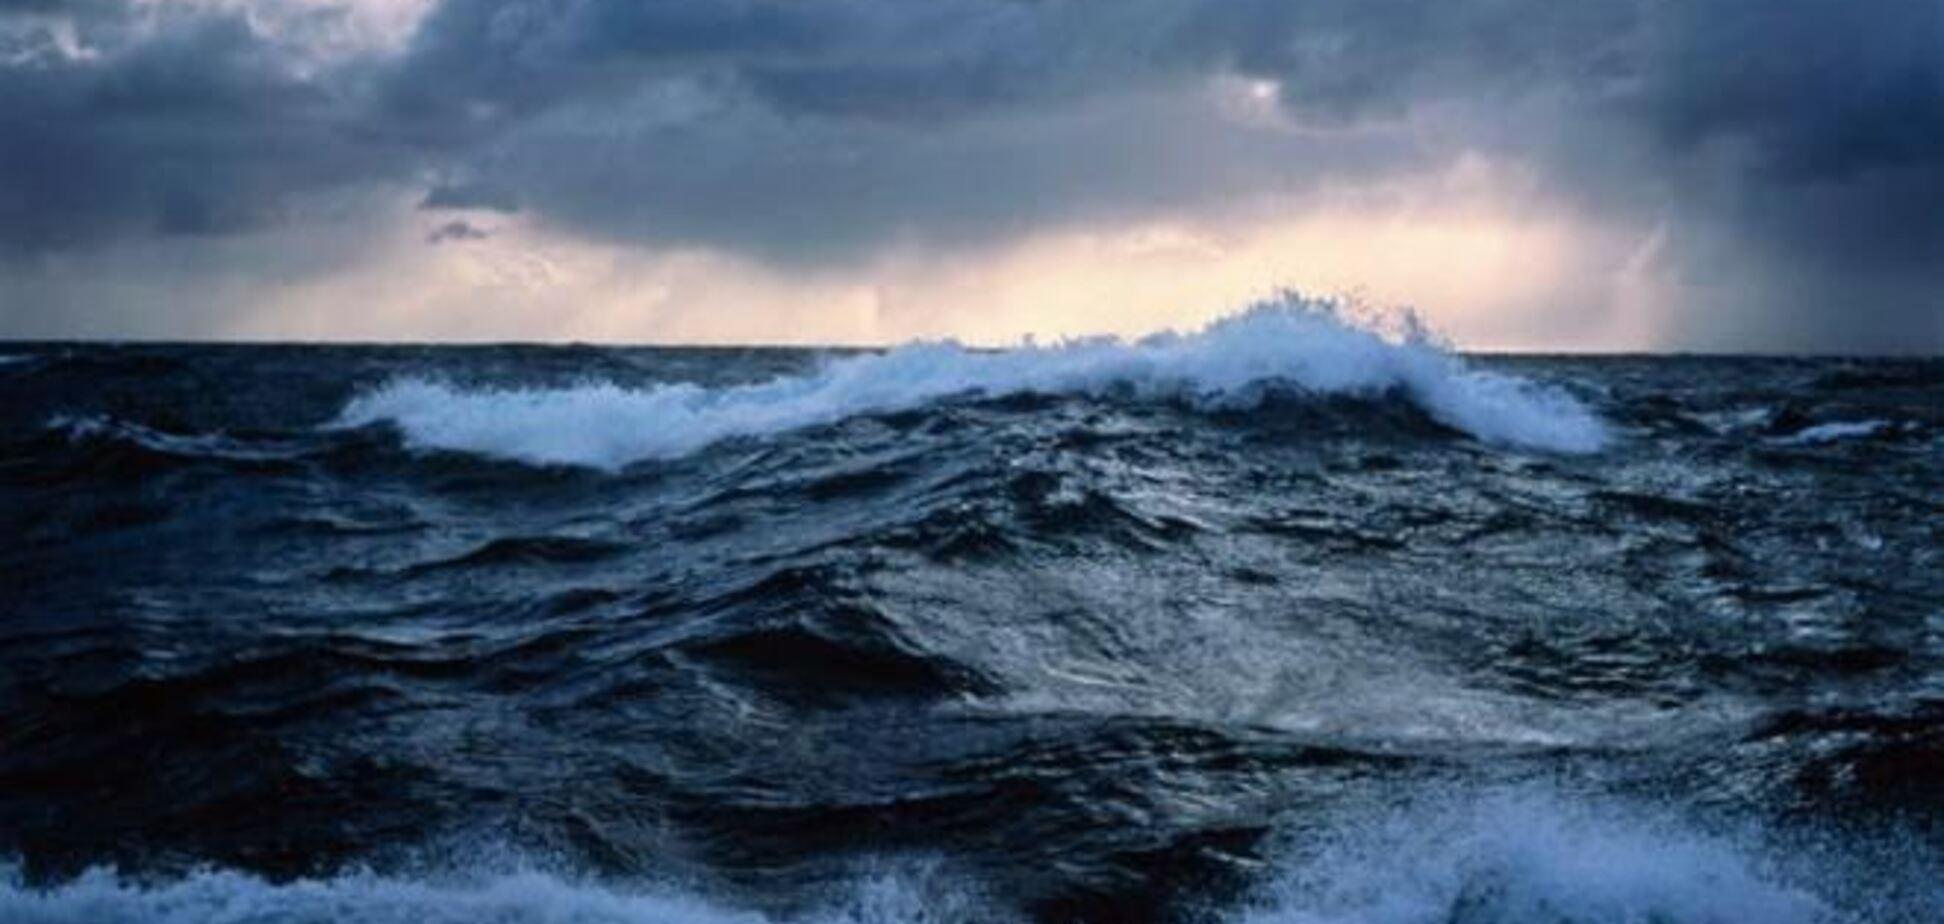 В Севастополе суднам запретили выход в море из-за шторма